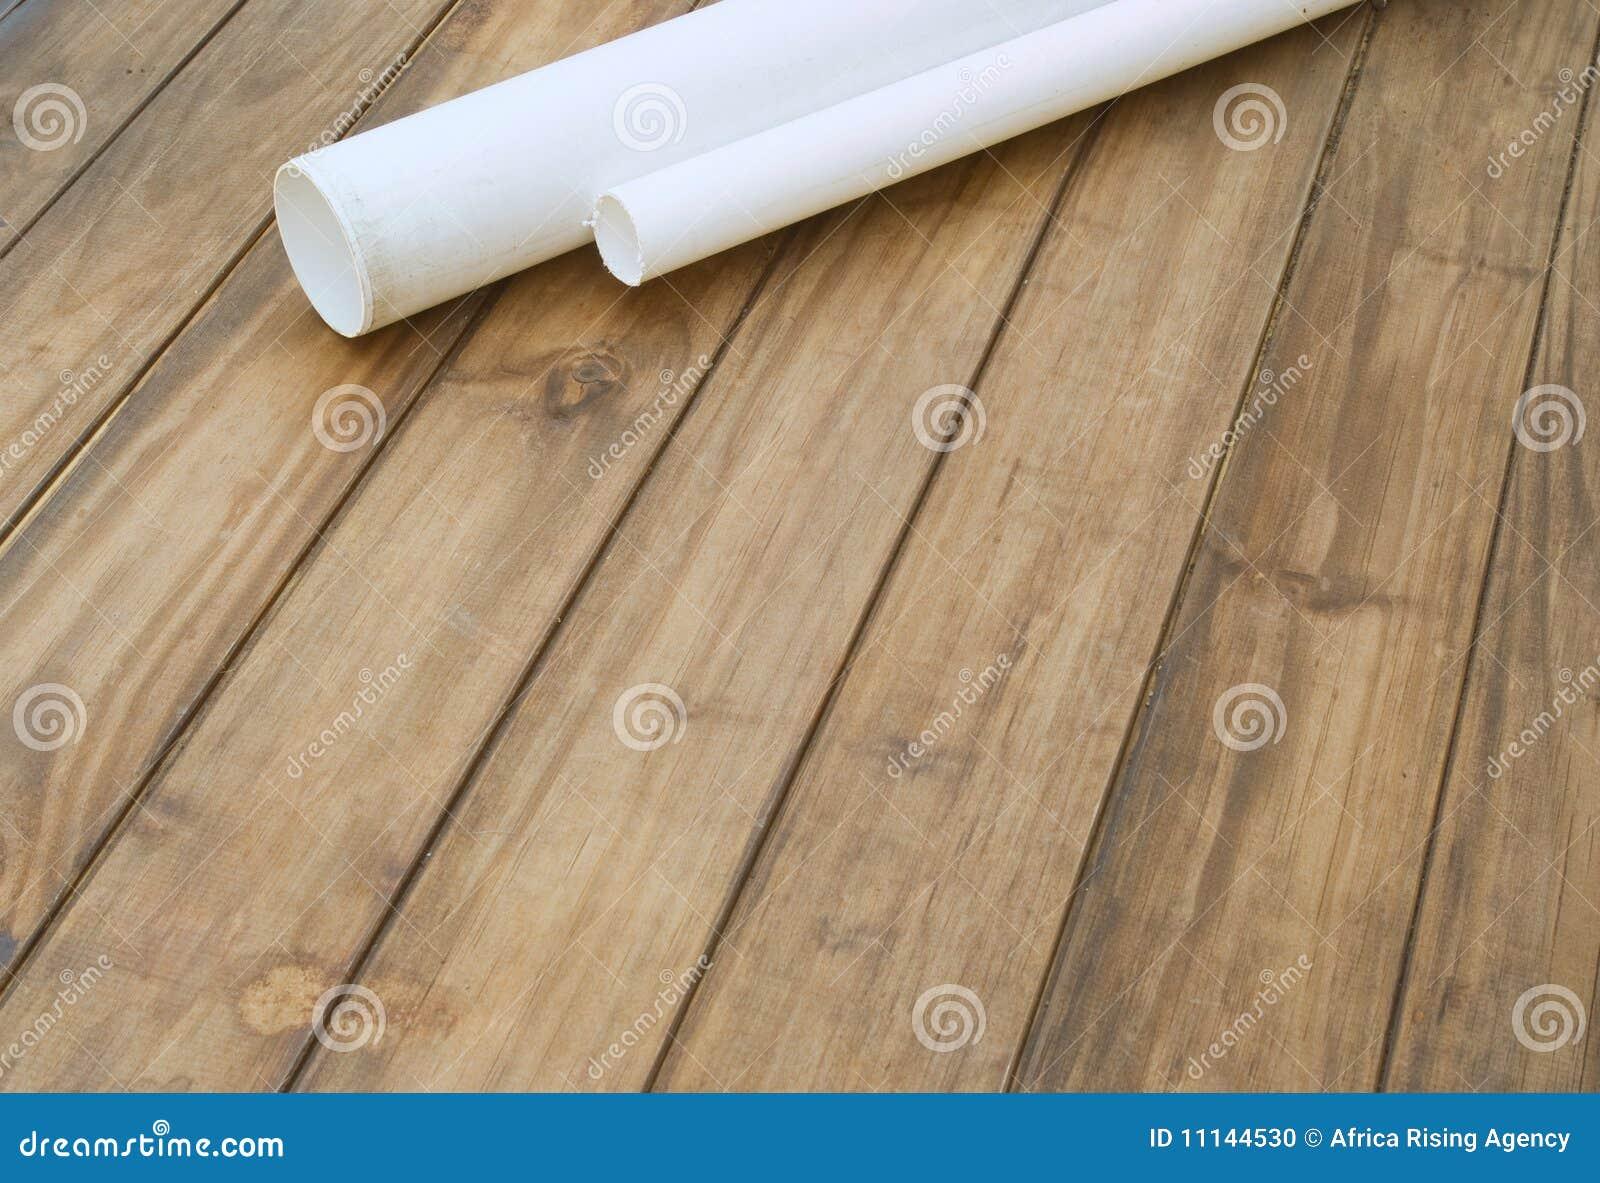 Home Improvement Plumbing Pipes Background Stock Photo ...  Home Improvemen...